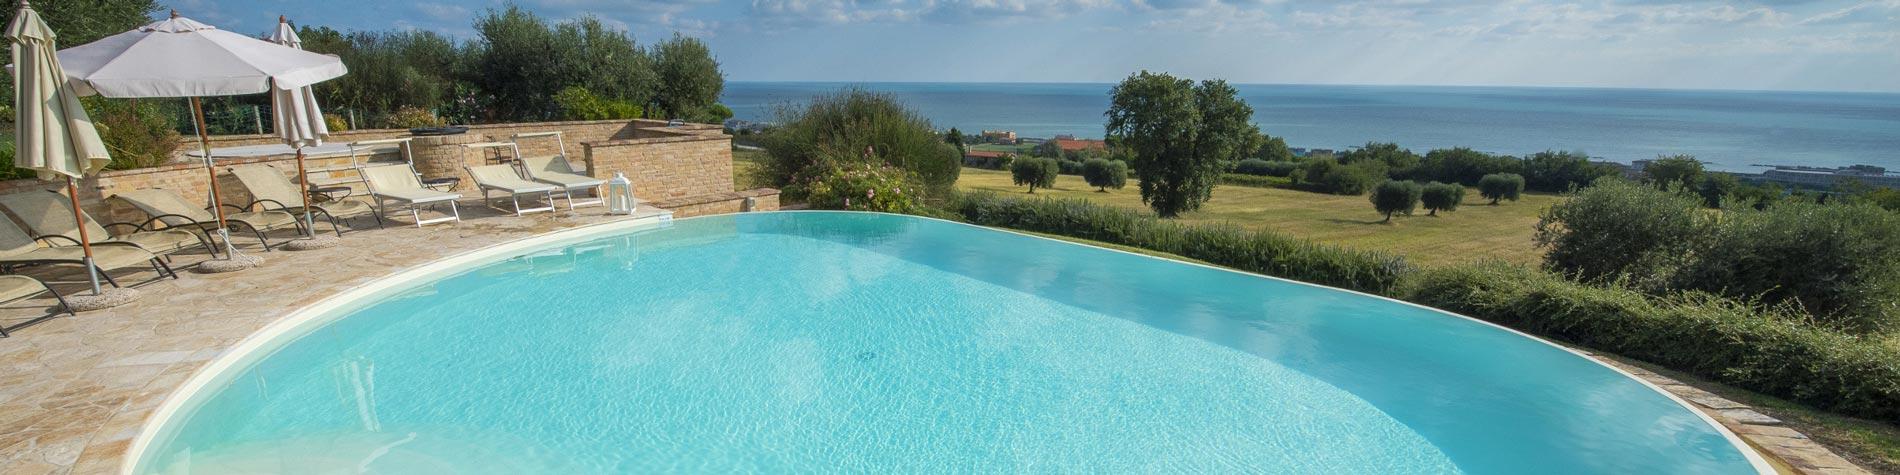 Post vendita professione piscina - Vendita piscine pescara ...